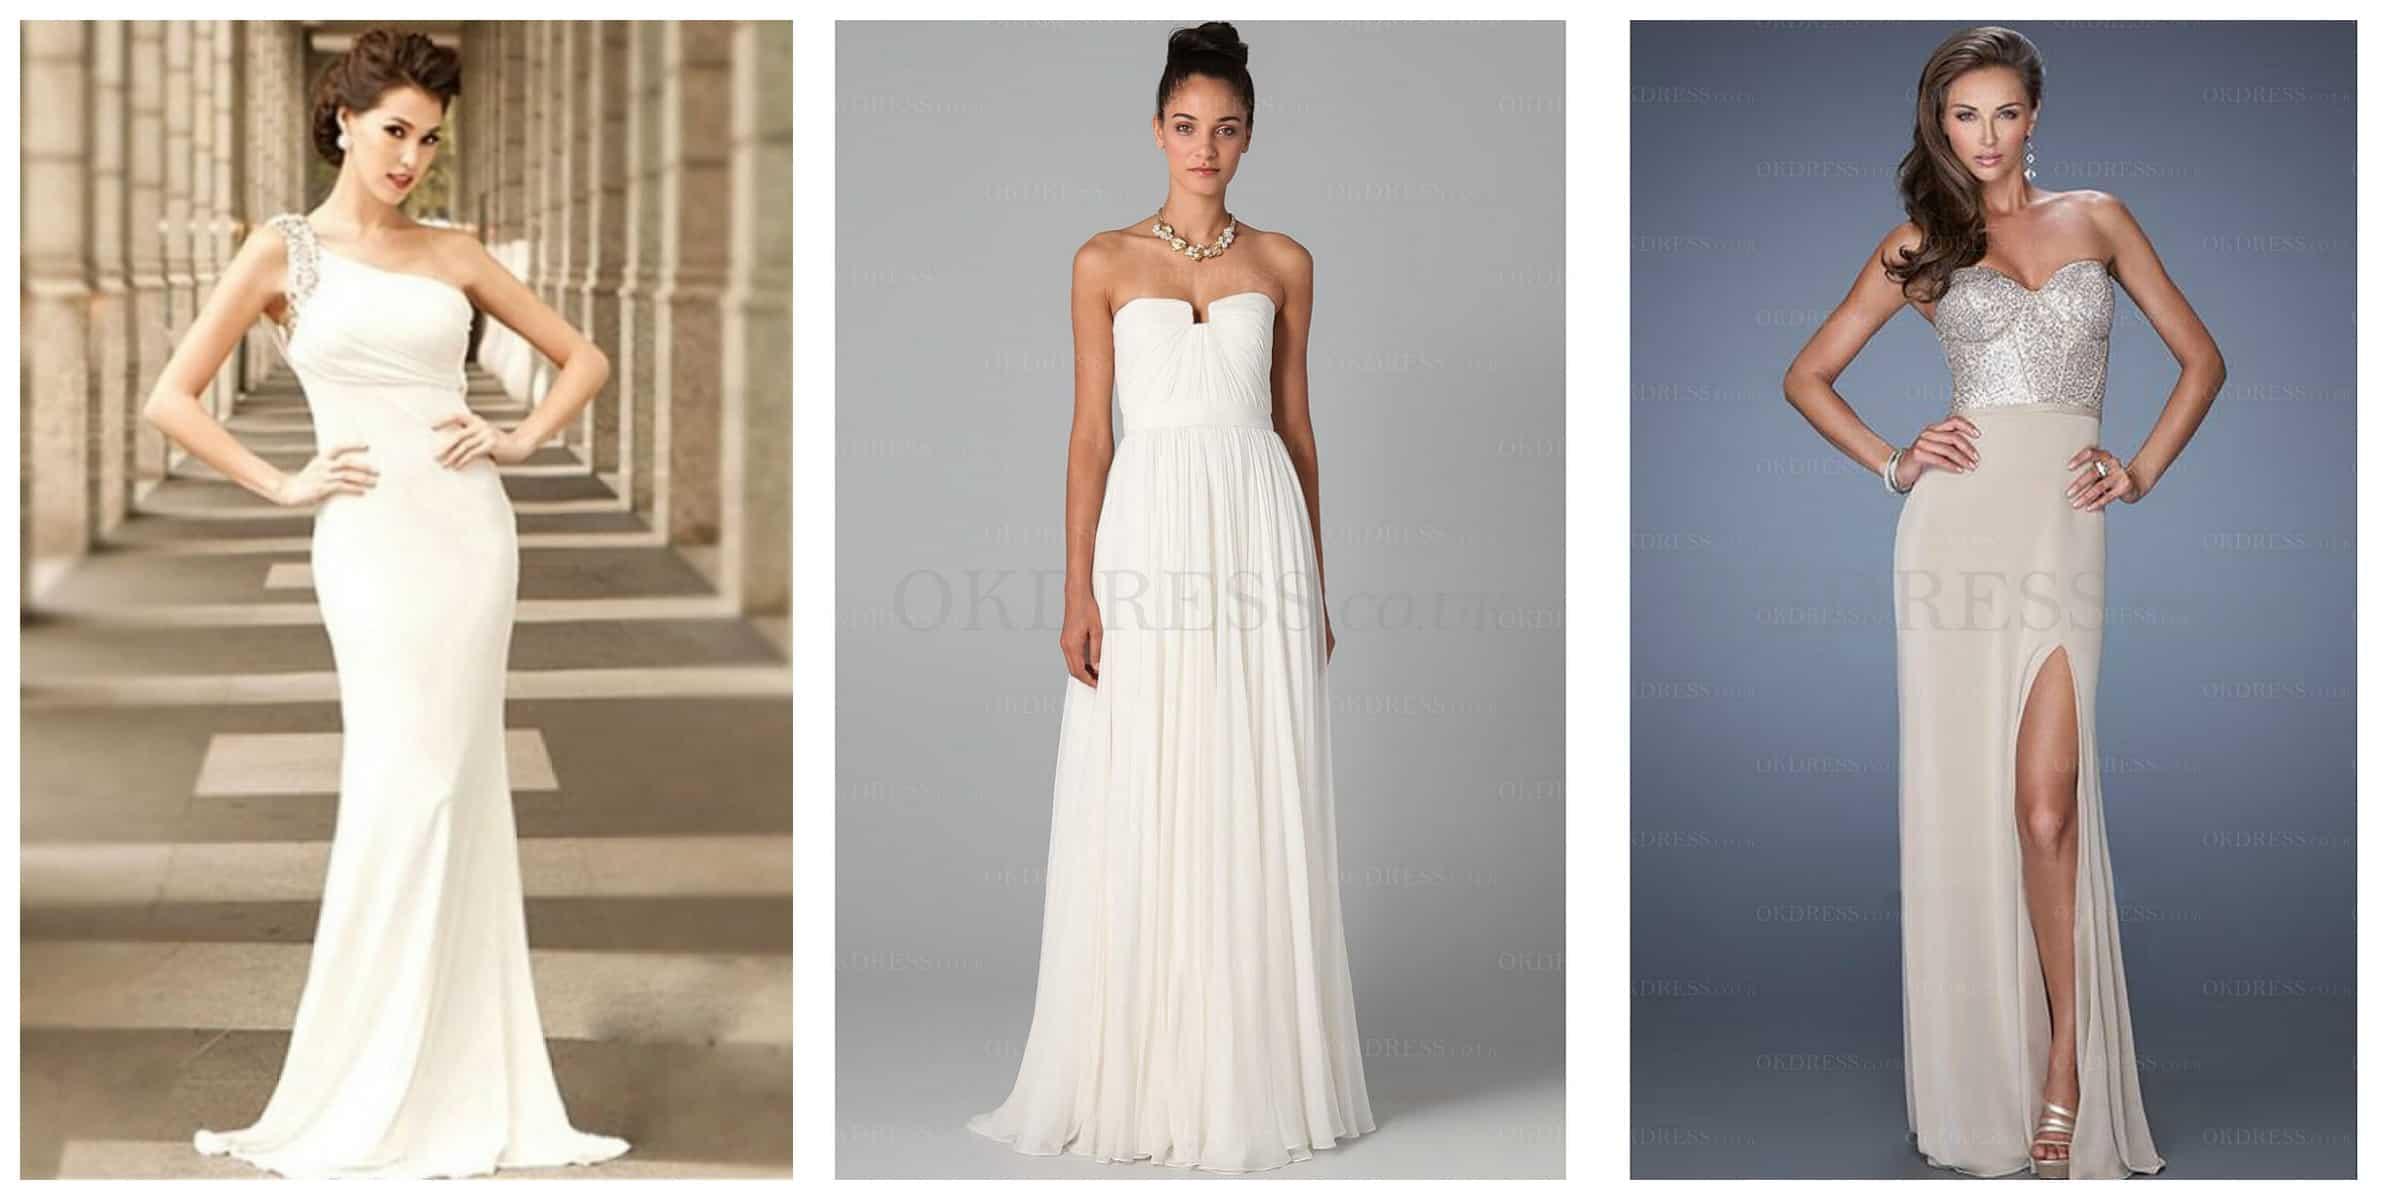 evening dresses from OK DRESS